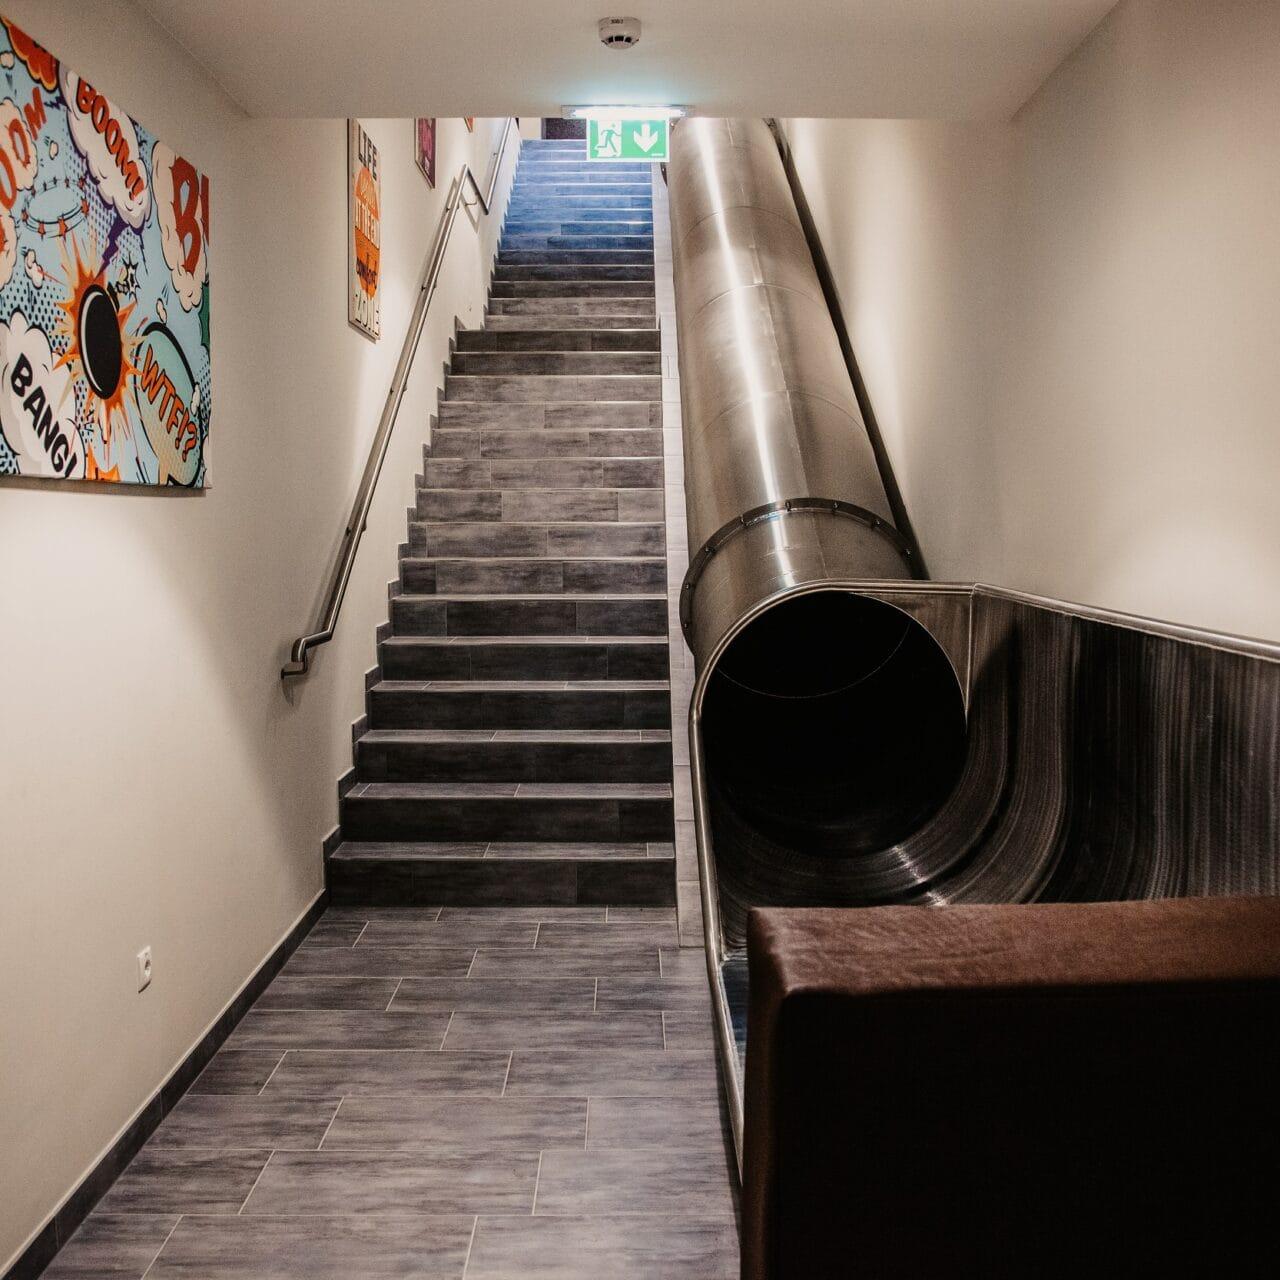 hofgut-wagrain-apartment-lifestyle-resort-familienurlaub-rutsche.jpg